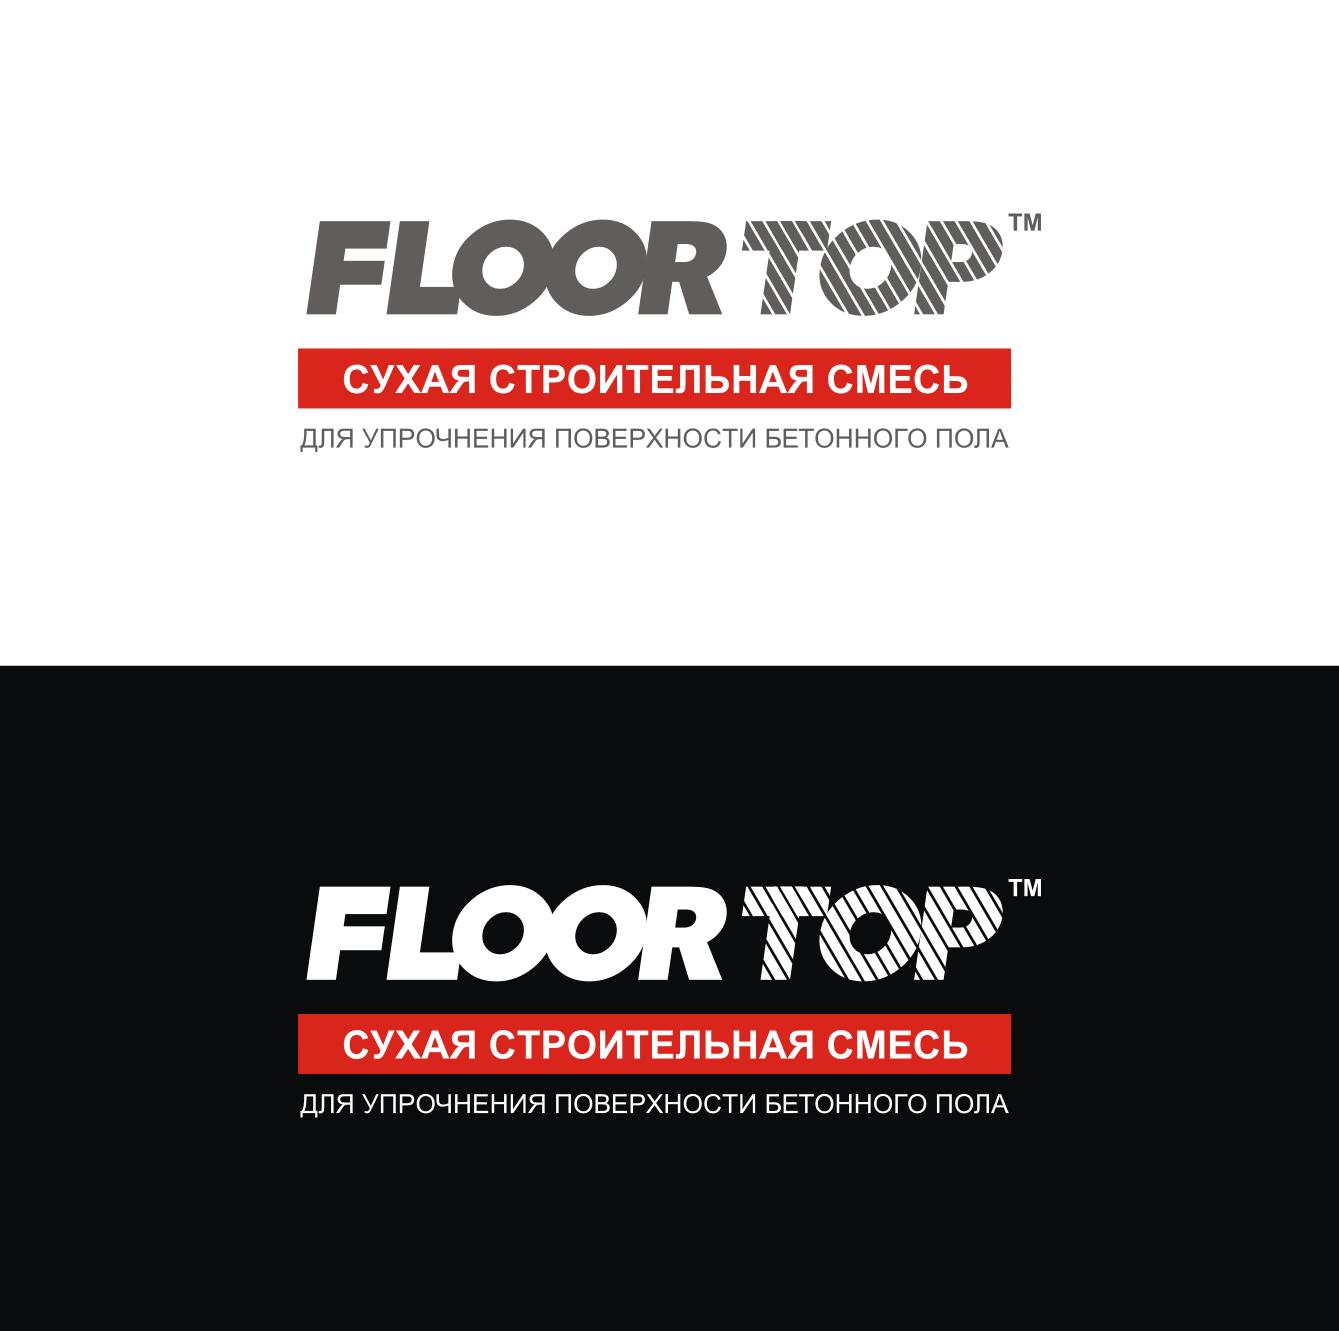 Разработка логотипа и дизайна на упаковку для сухой смеси фото f_2555d274b24b4ebd.png